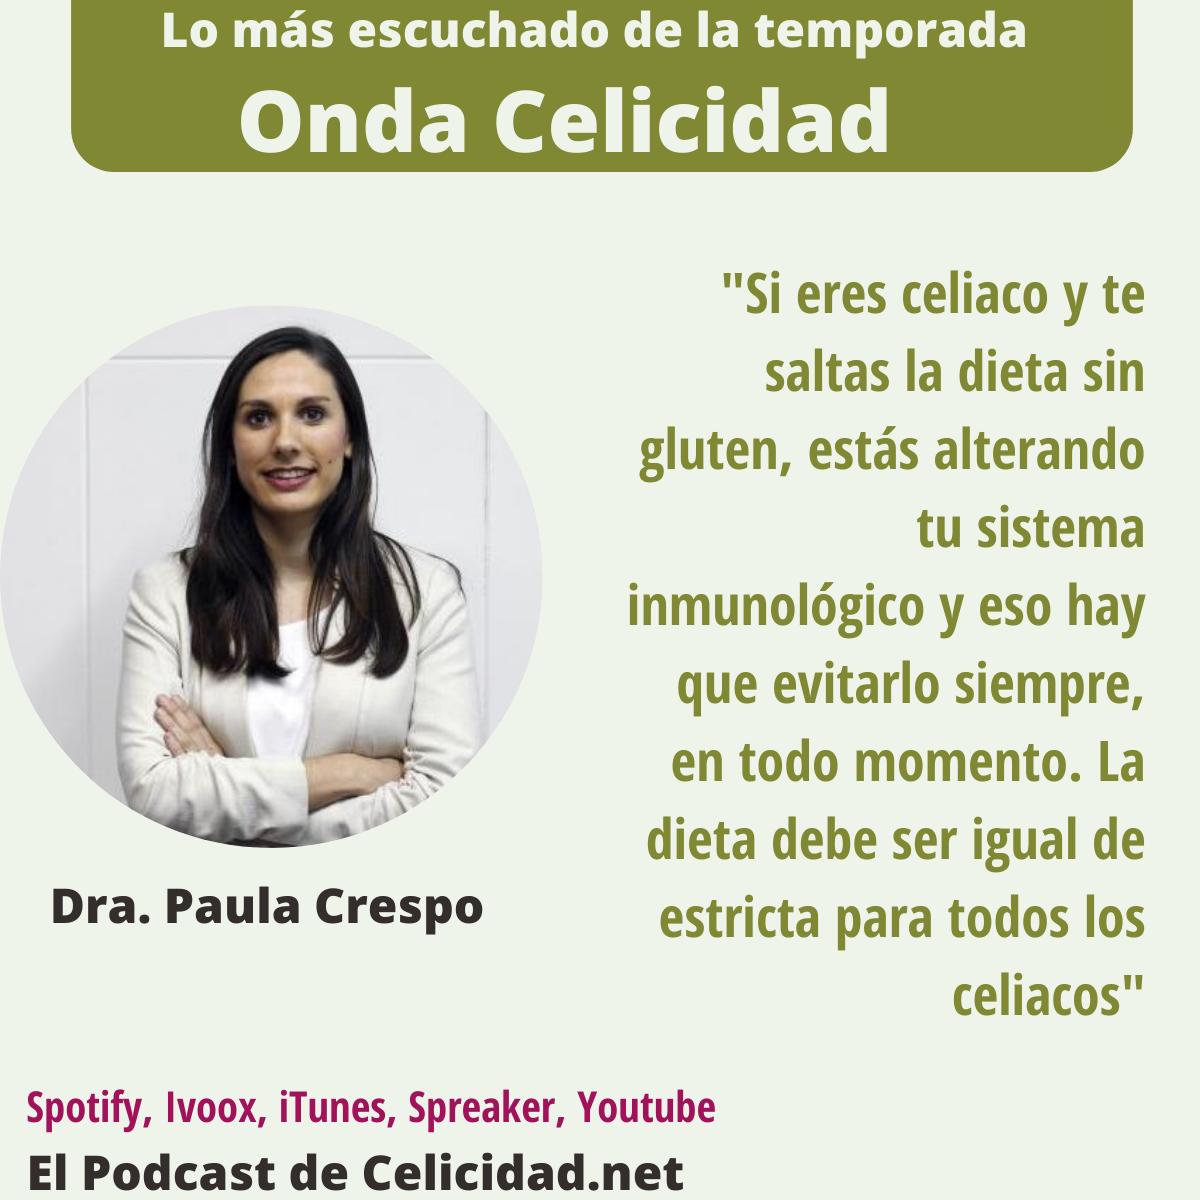 Dra. Paula Crespo